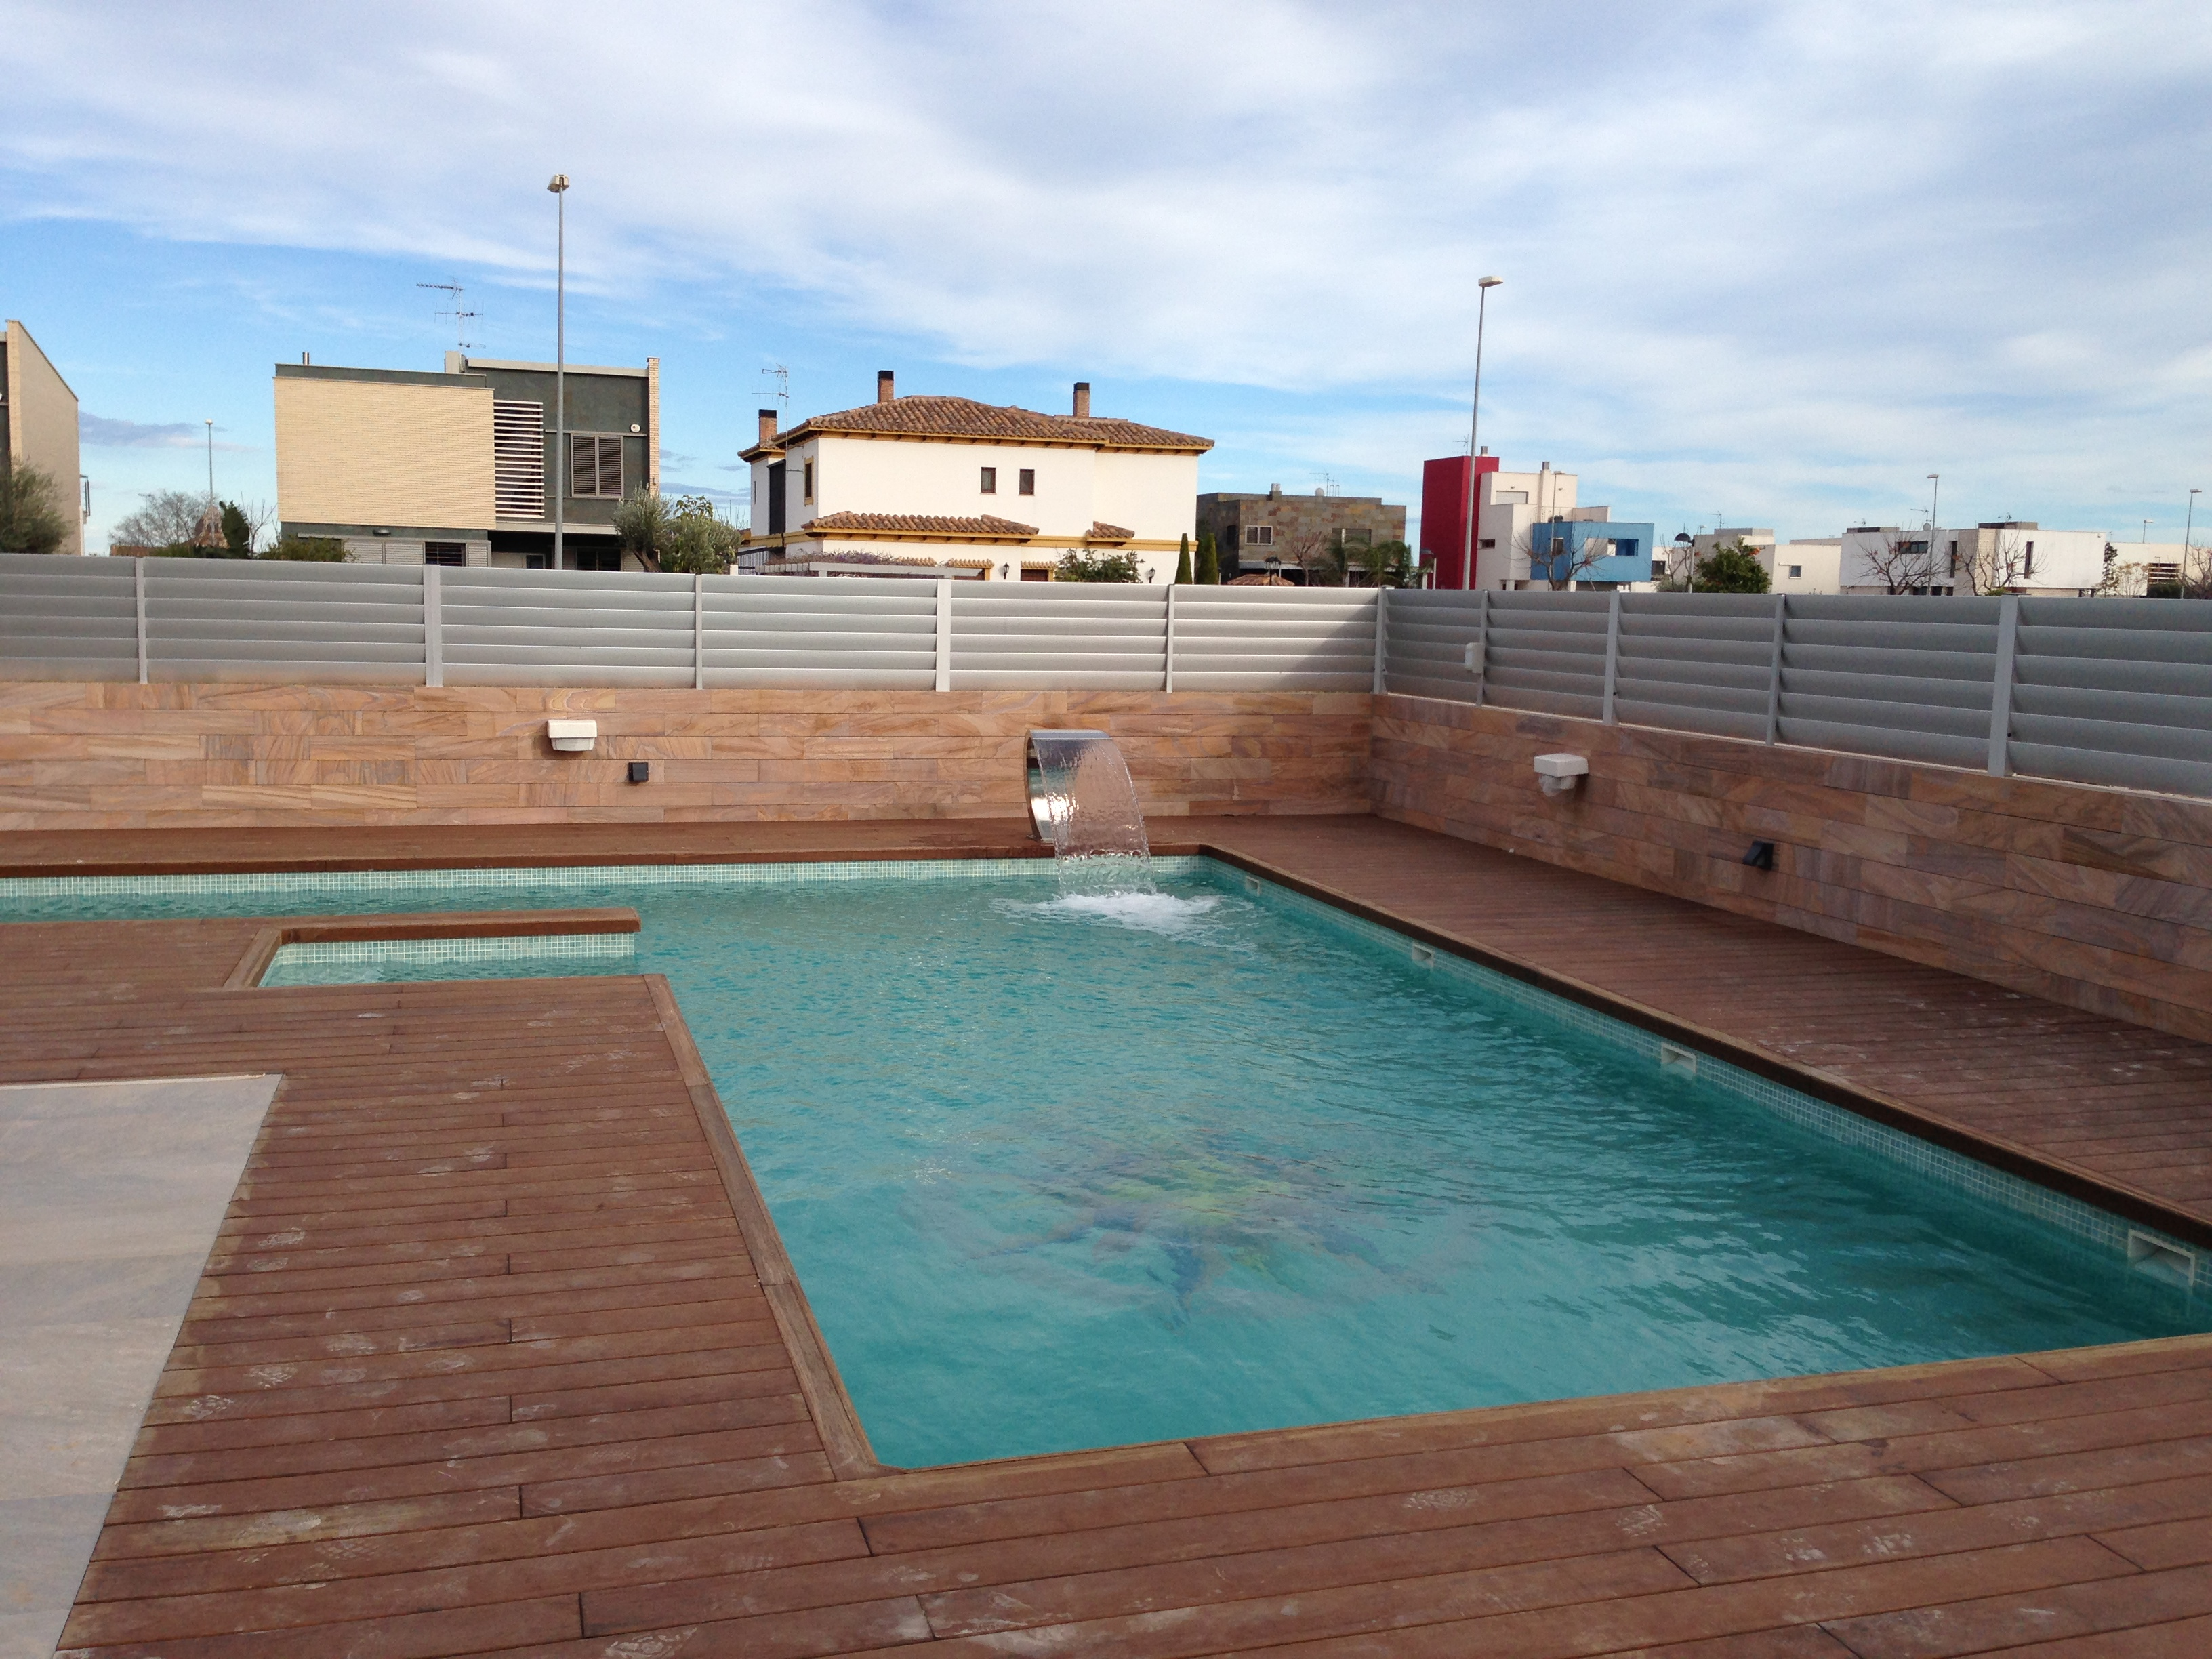 Madera piscinas thpool for Limpiadores de piscinas